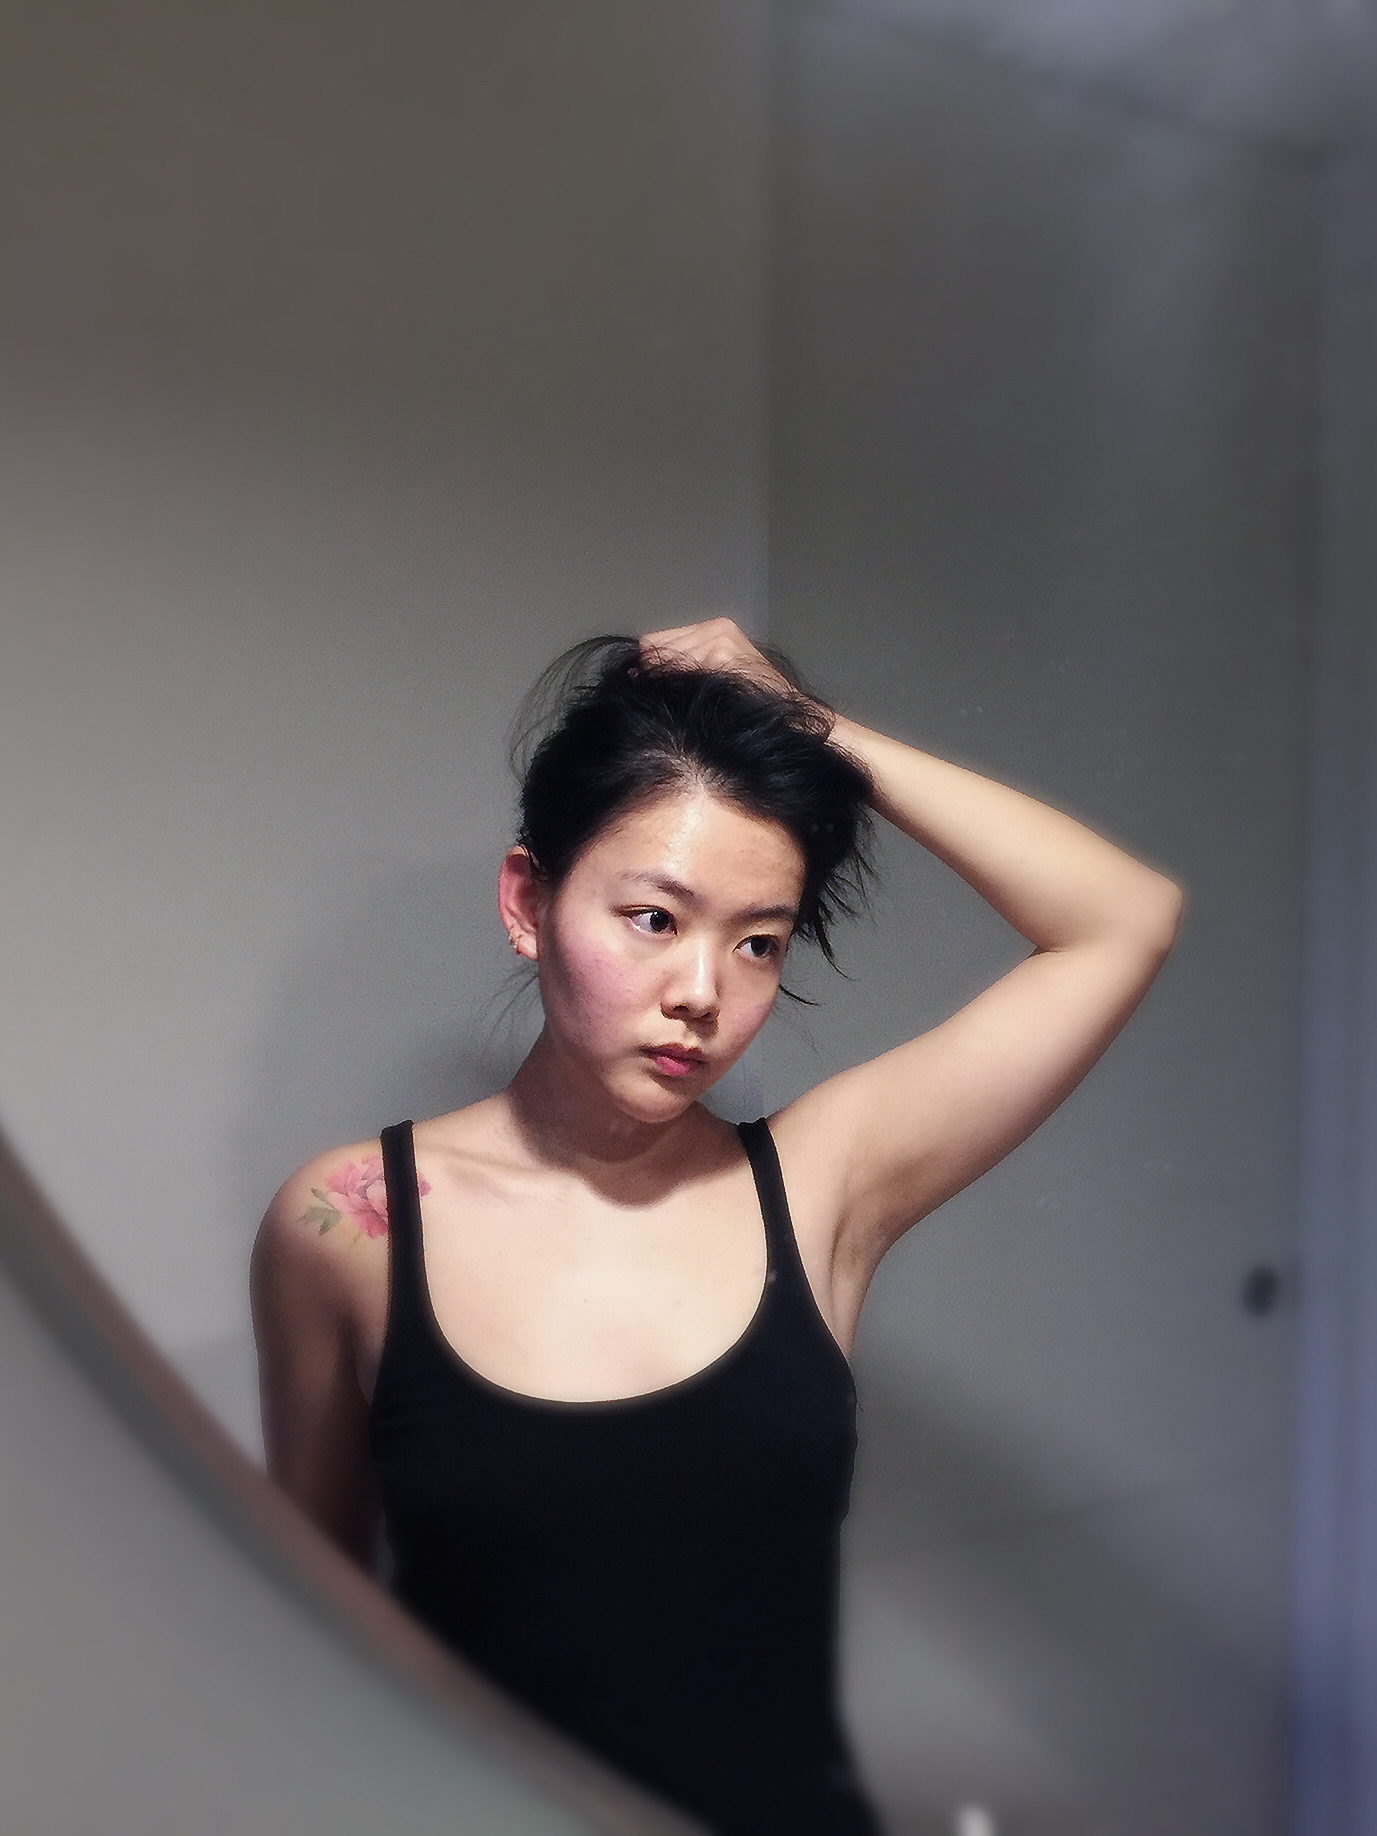 acne_prone_skin_6.JPG